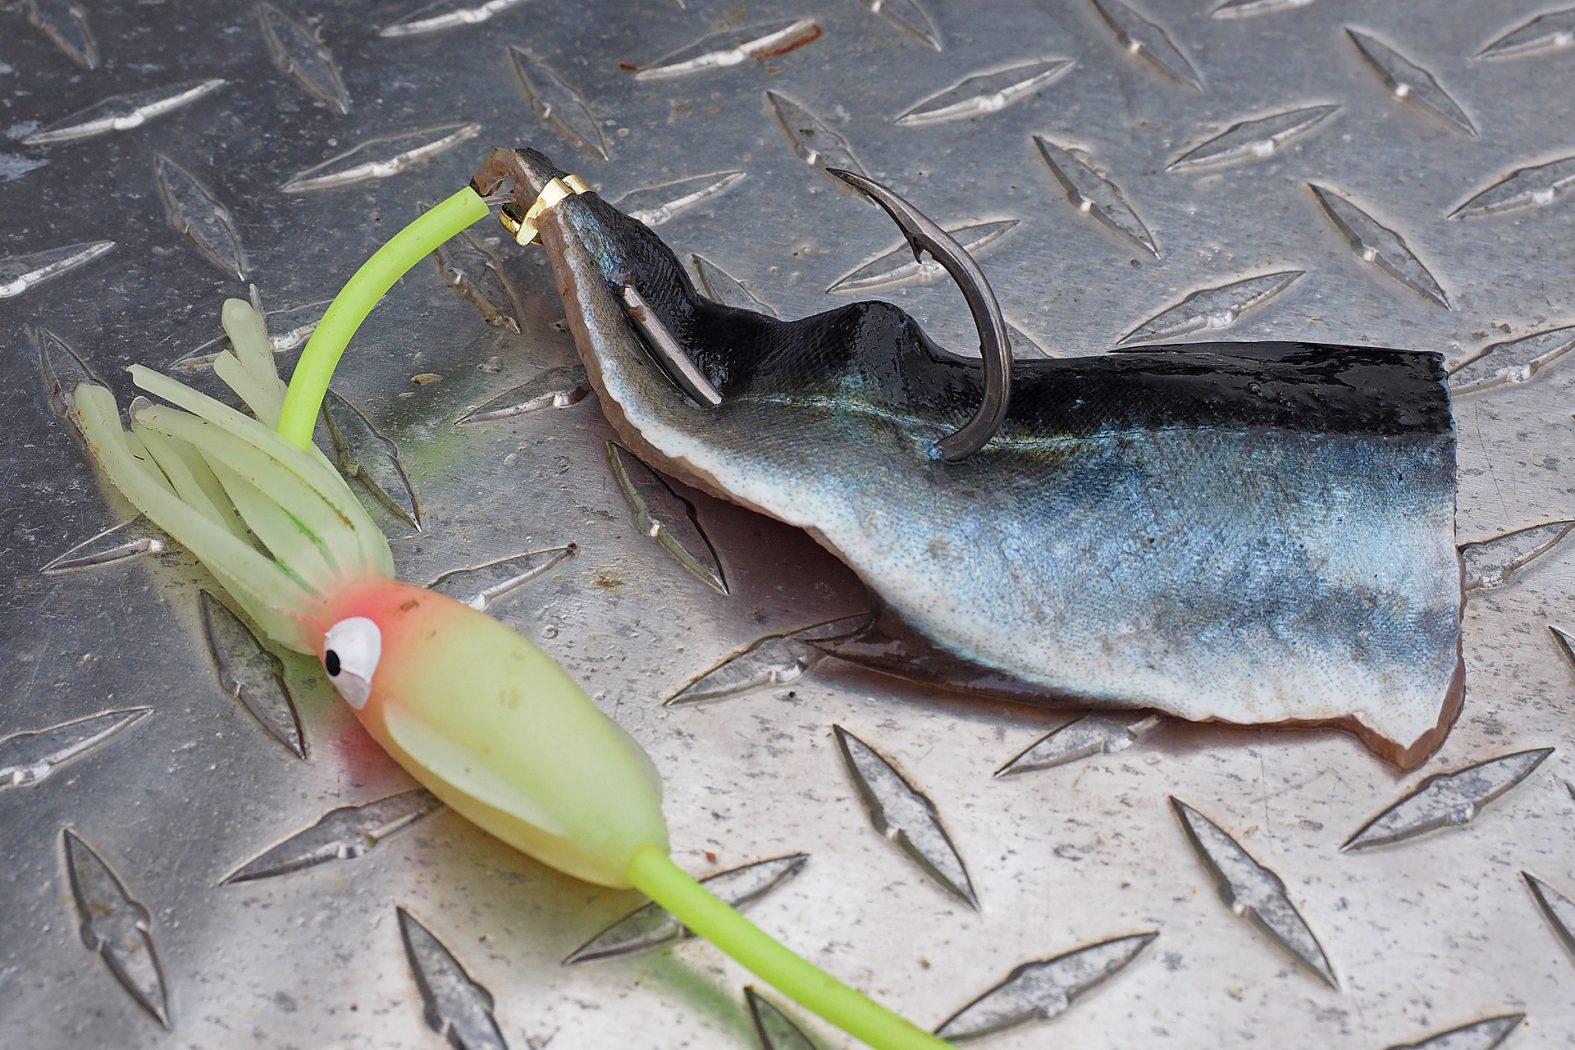 Filet anködern beim Tiefseeangeln